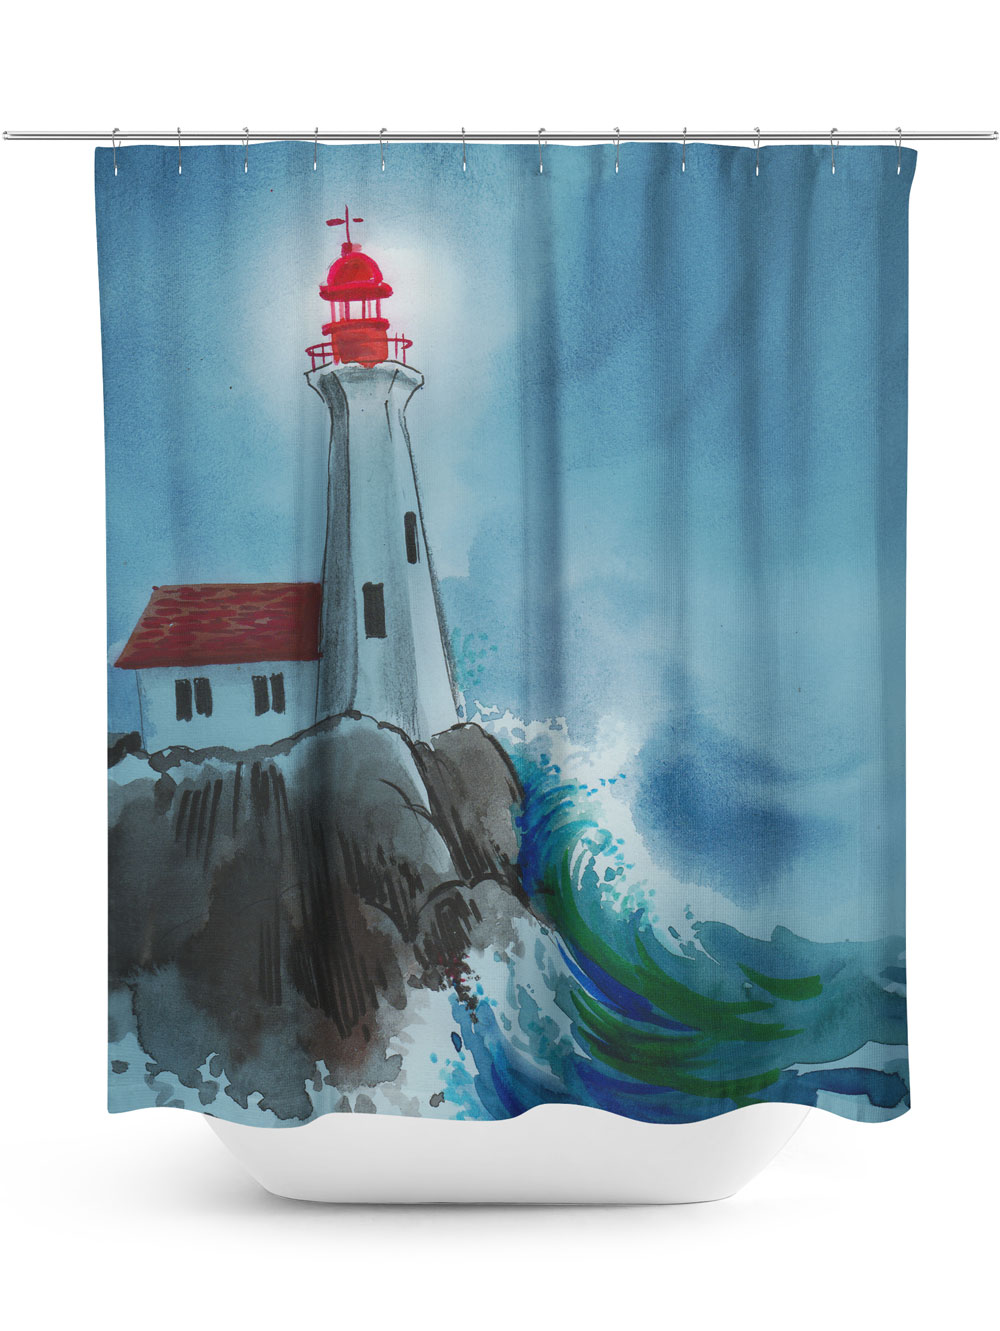 Digital Art Lighthouse Shower Curtain